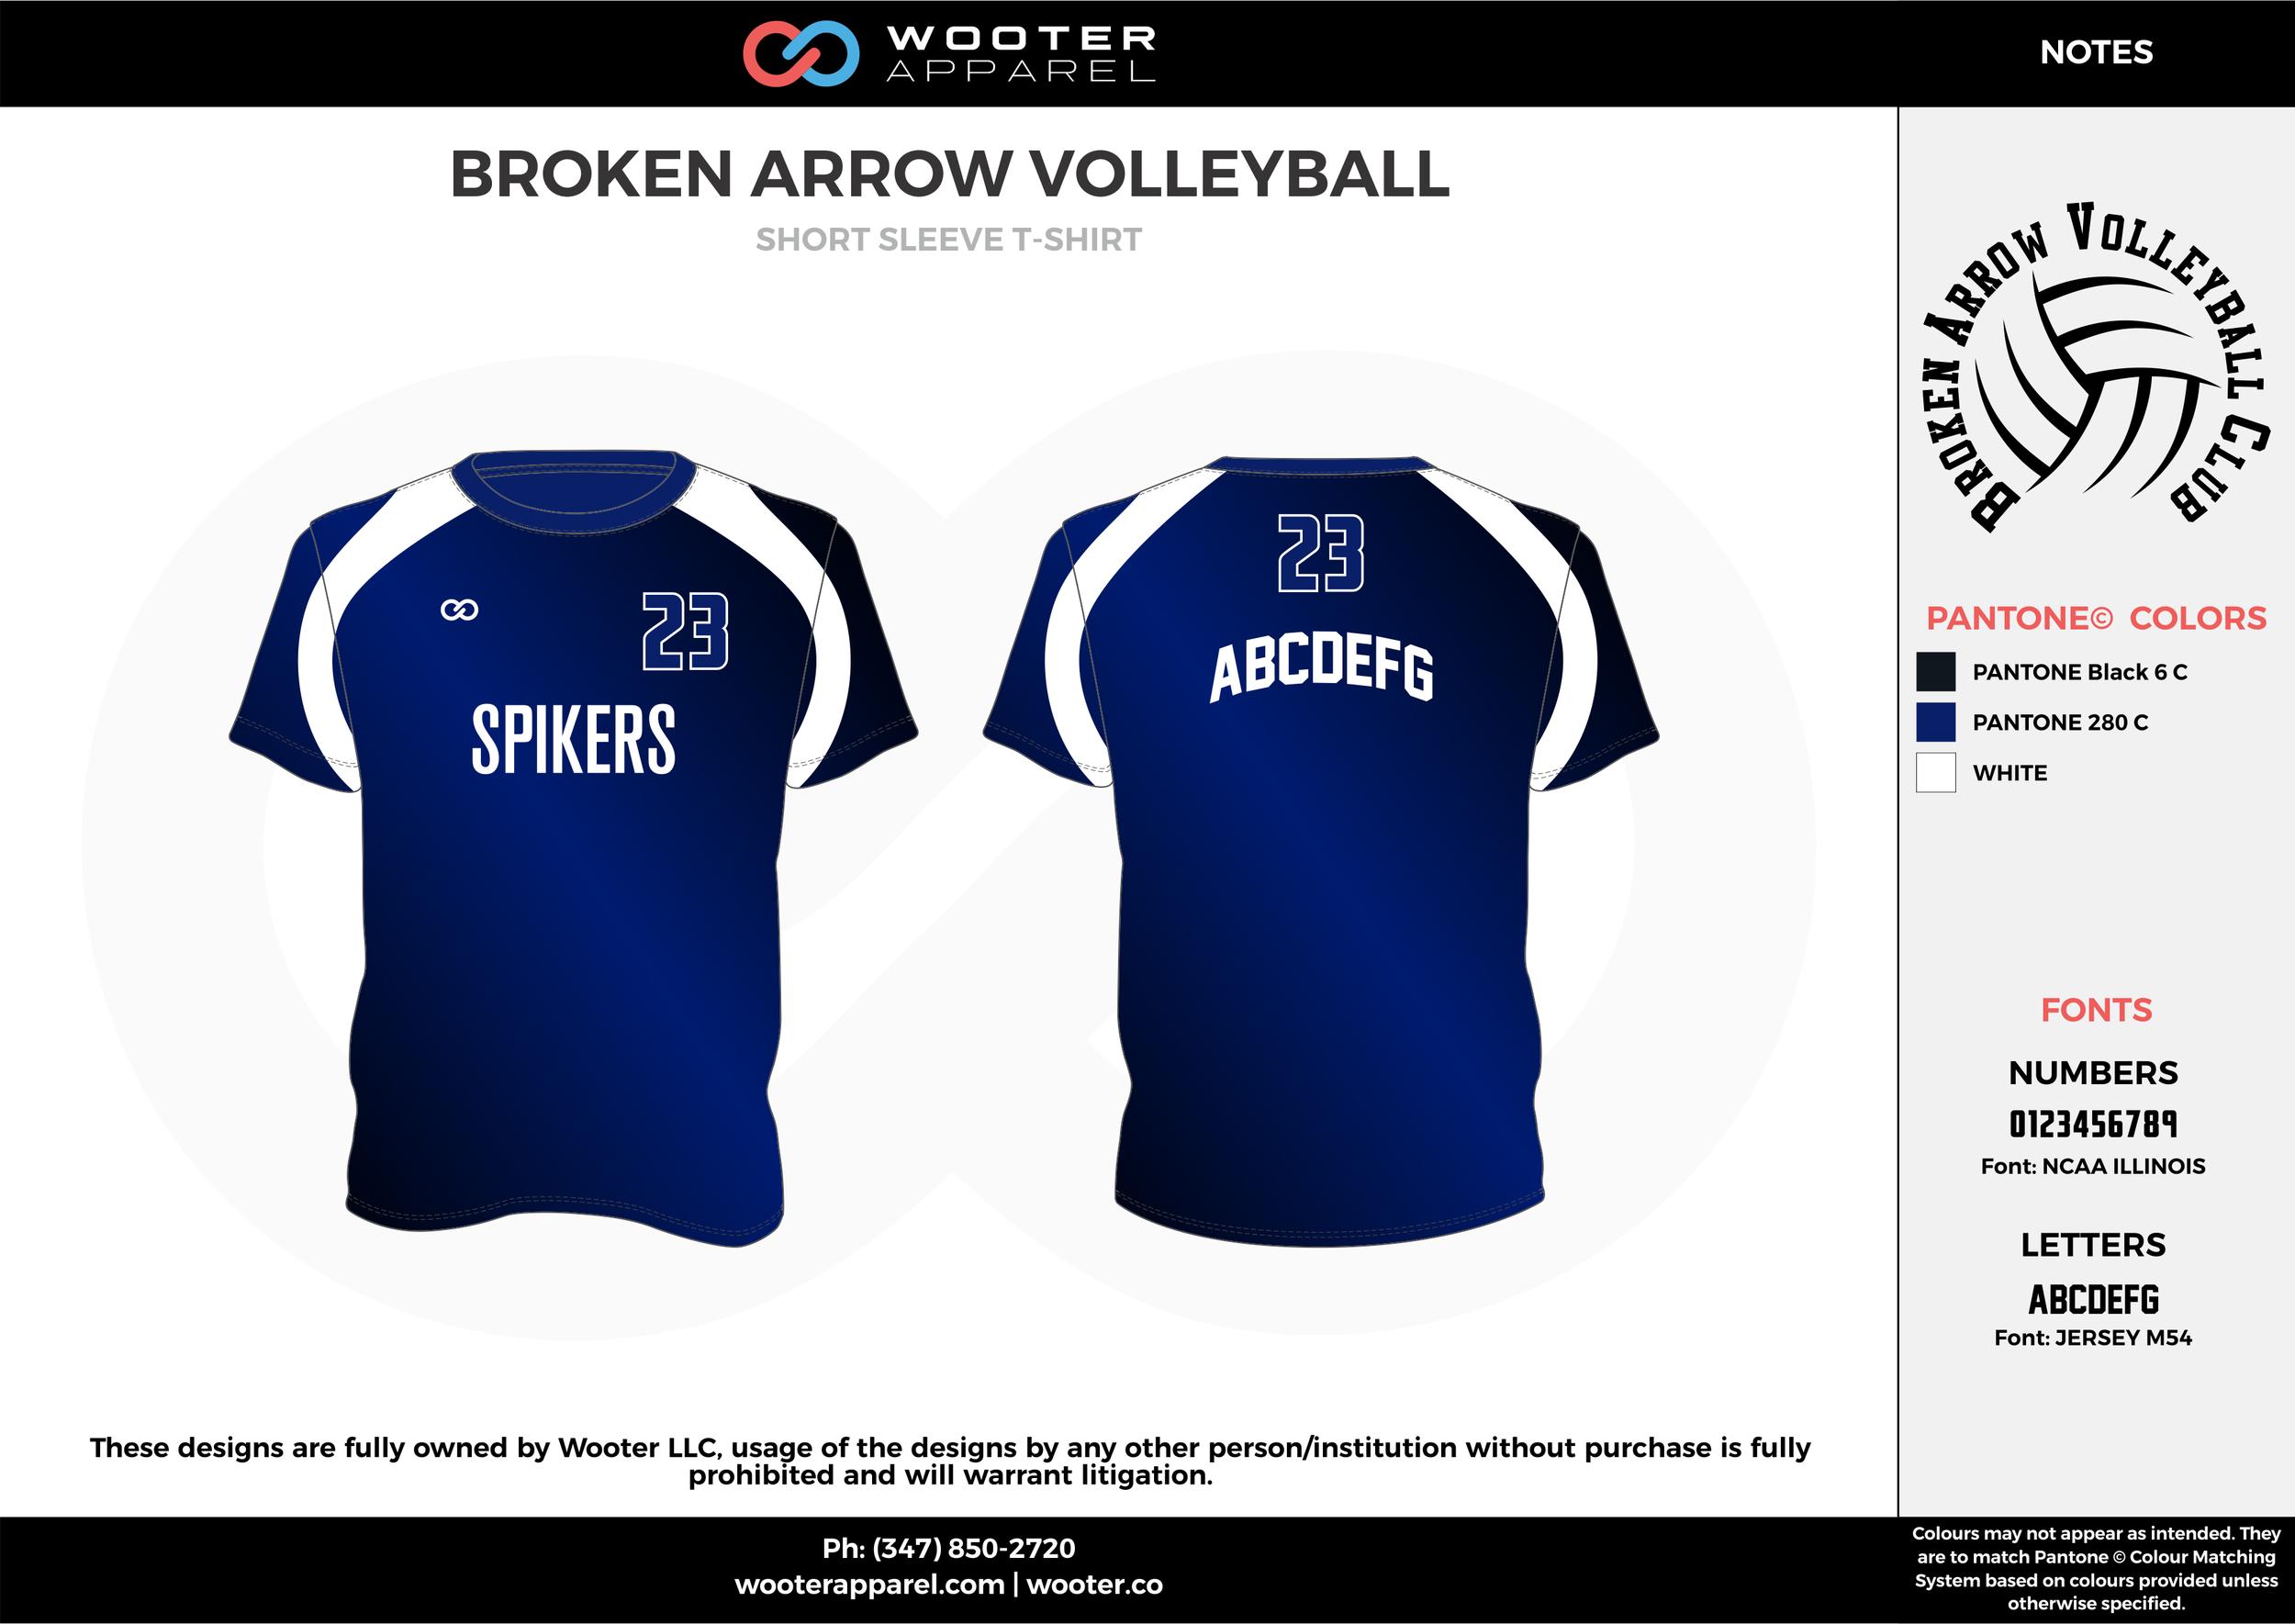 BROKEN ARROW VOLLEYBALL black blue white Volleyball Uniforms, Jerseys, Shorts